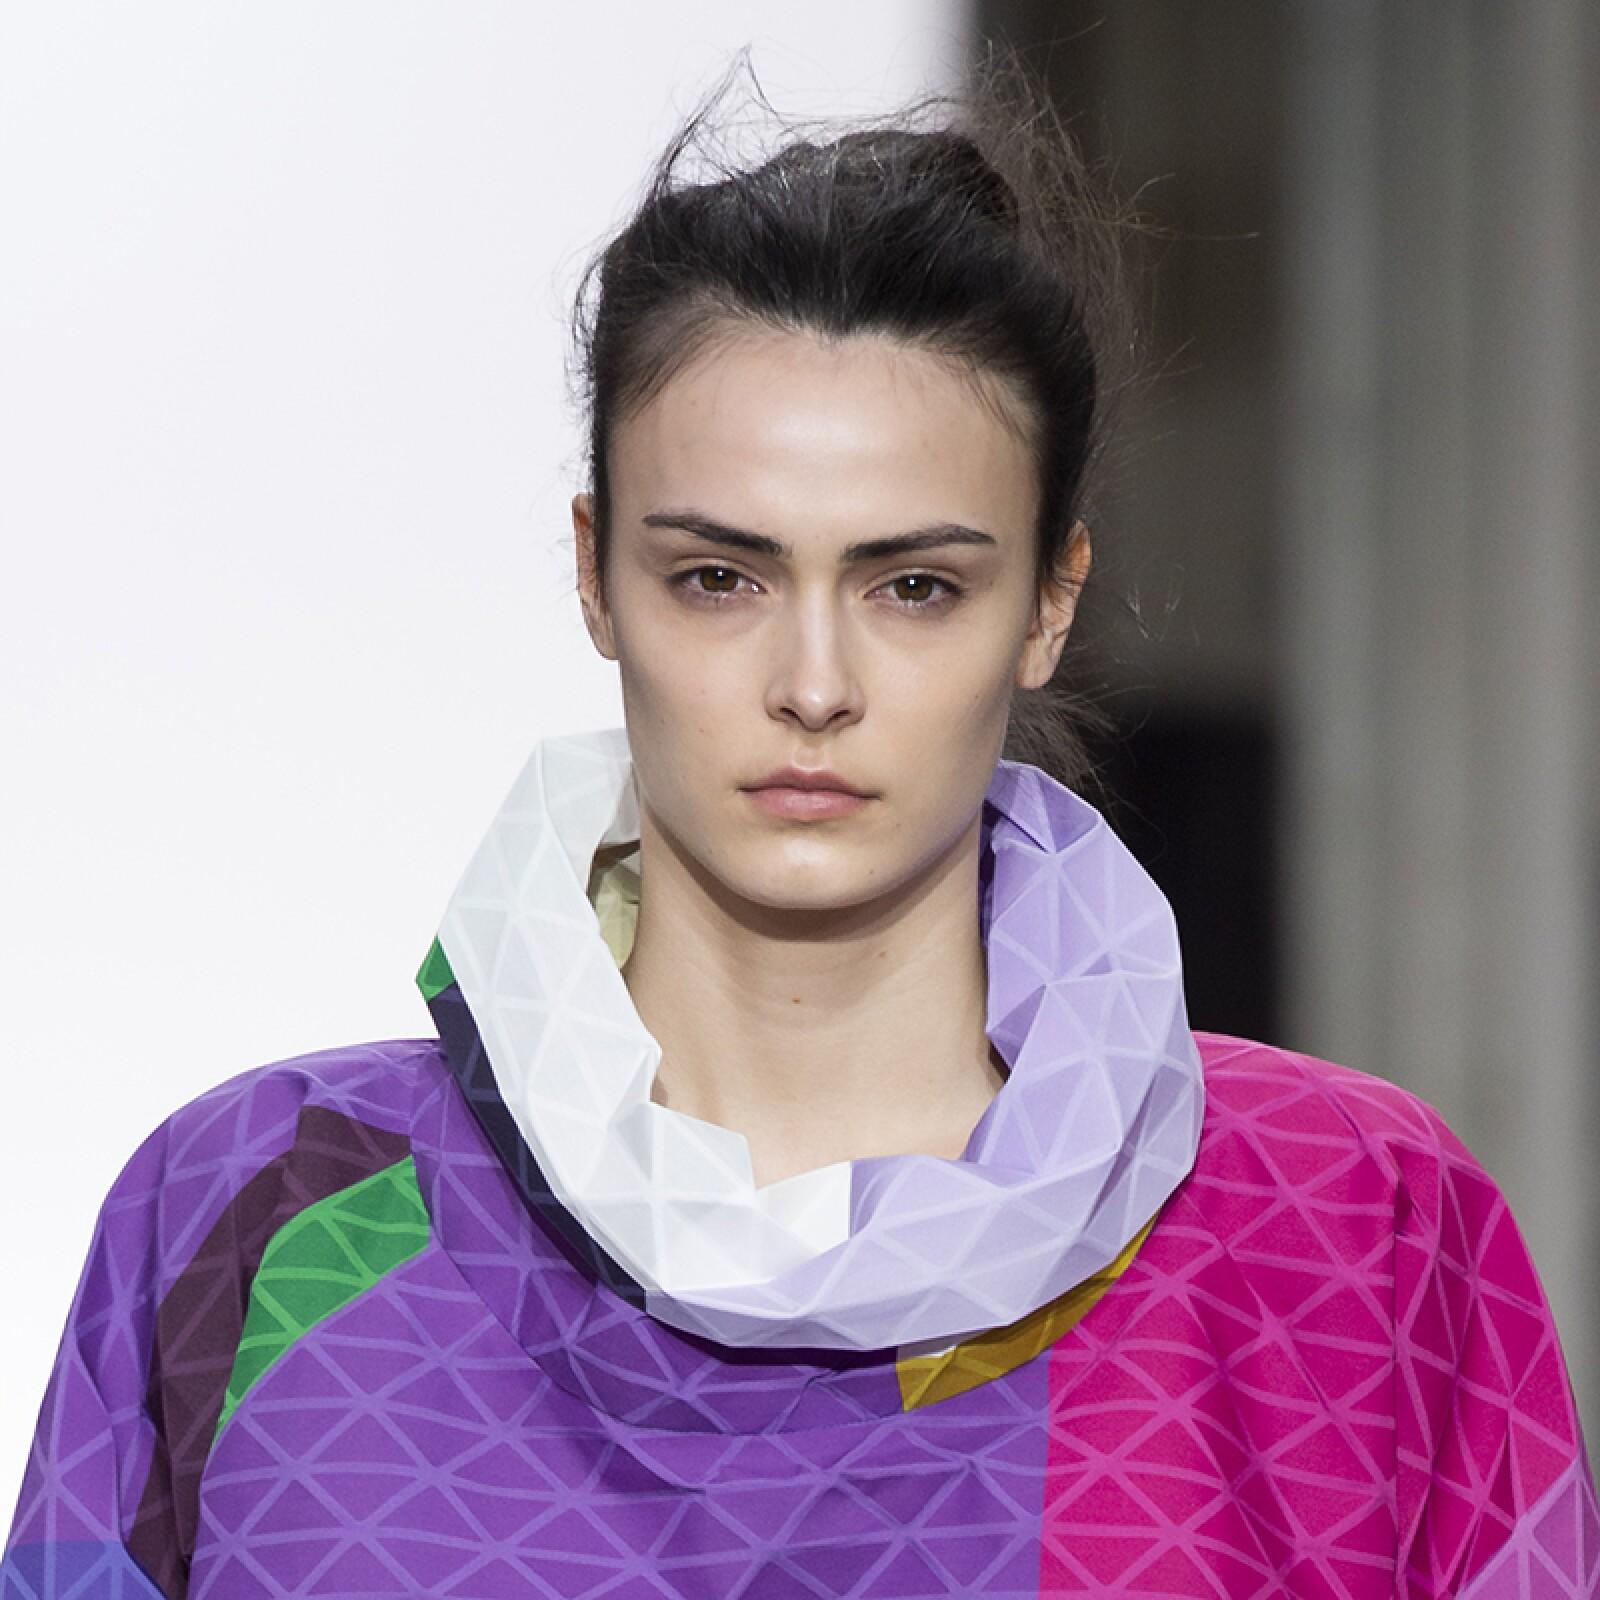 PFW-Paris-Fashion-Week-Runway-Pasarela-Beauty-Look-Belleza-Issey-Miyake